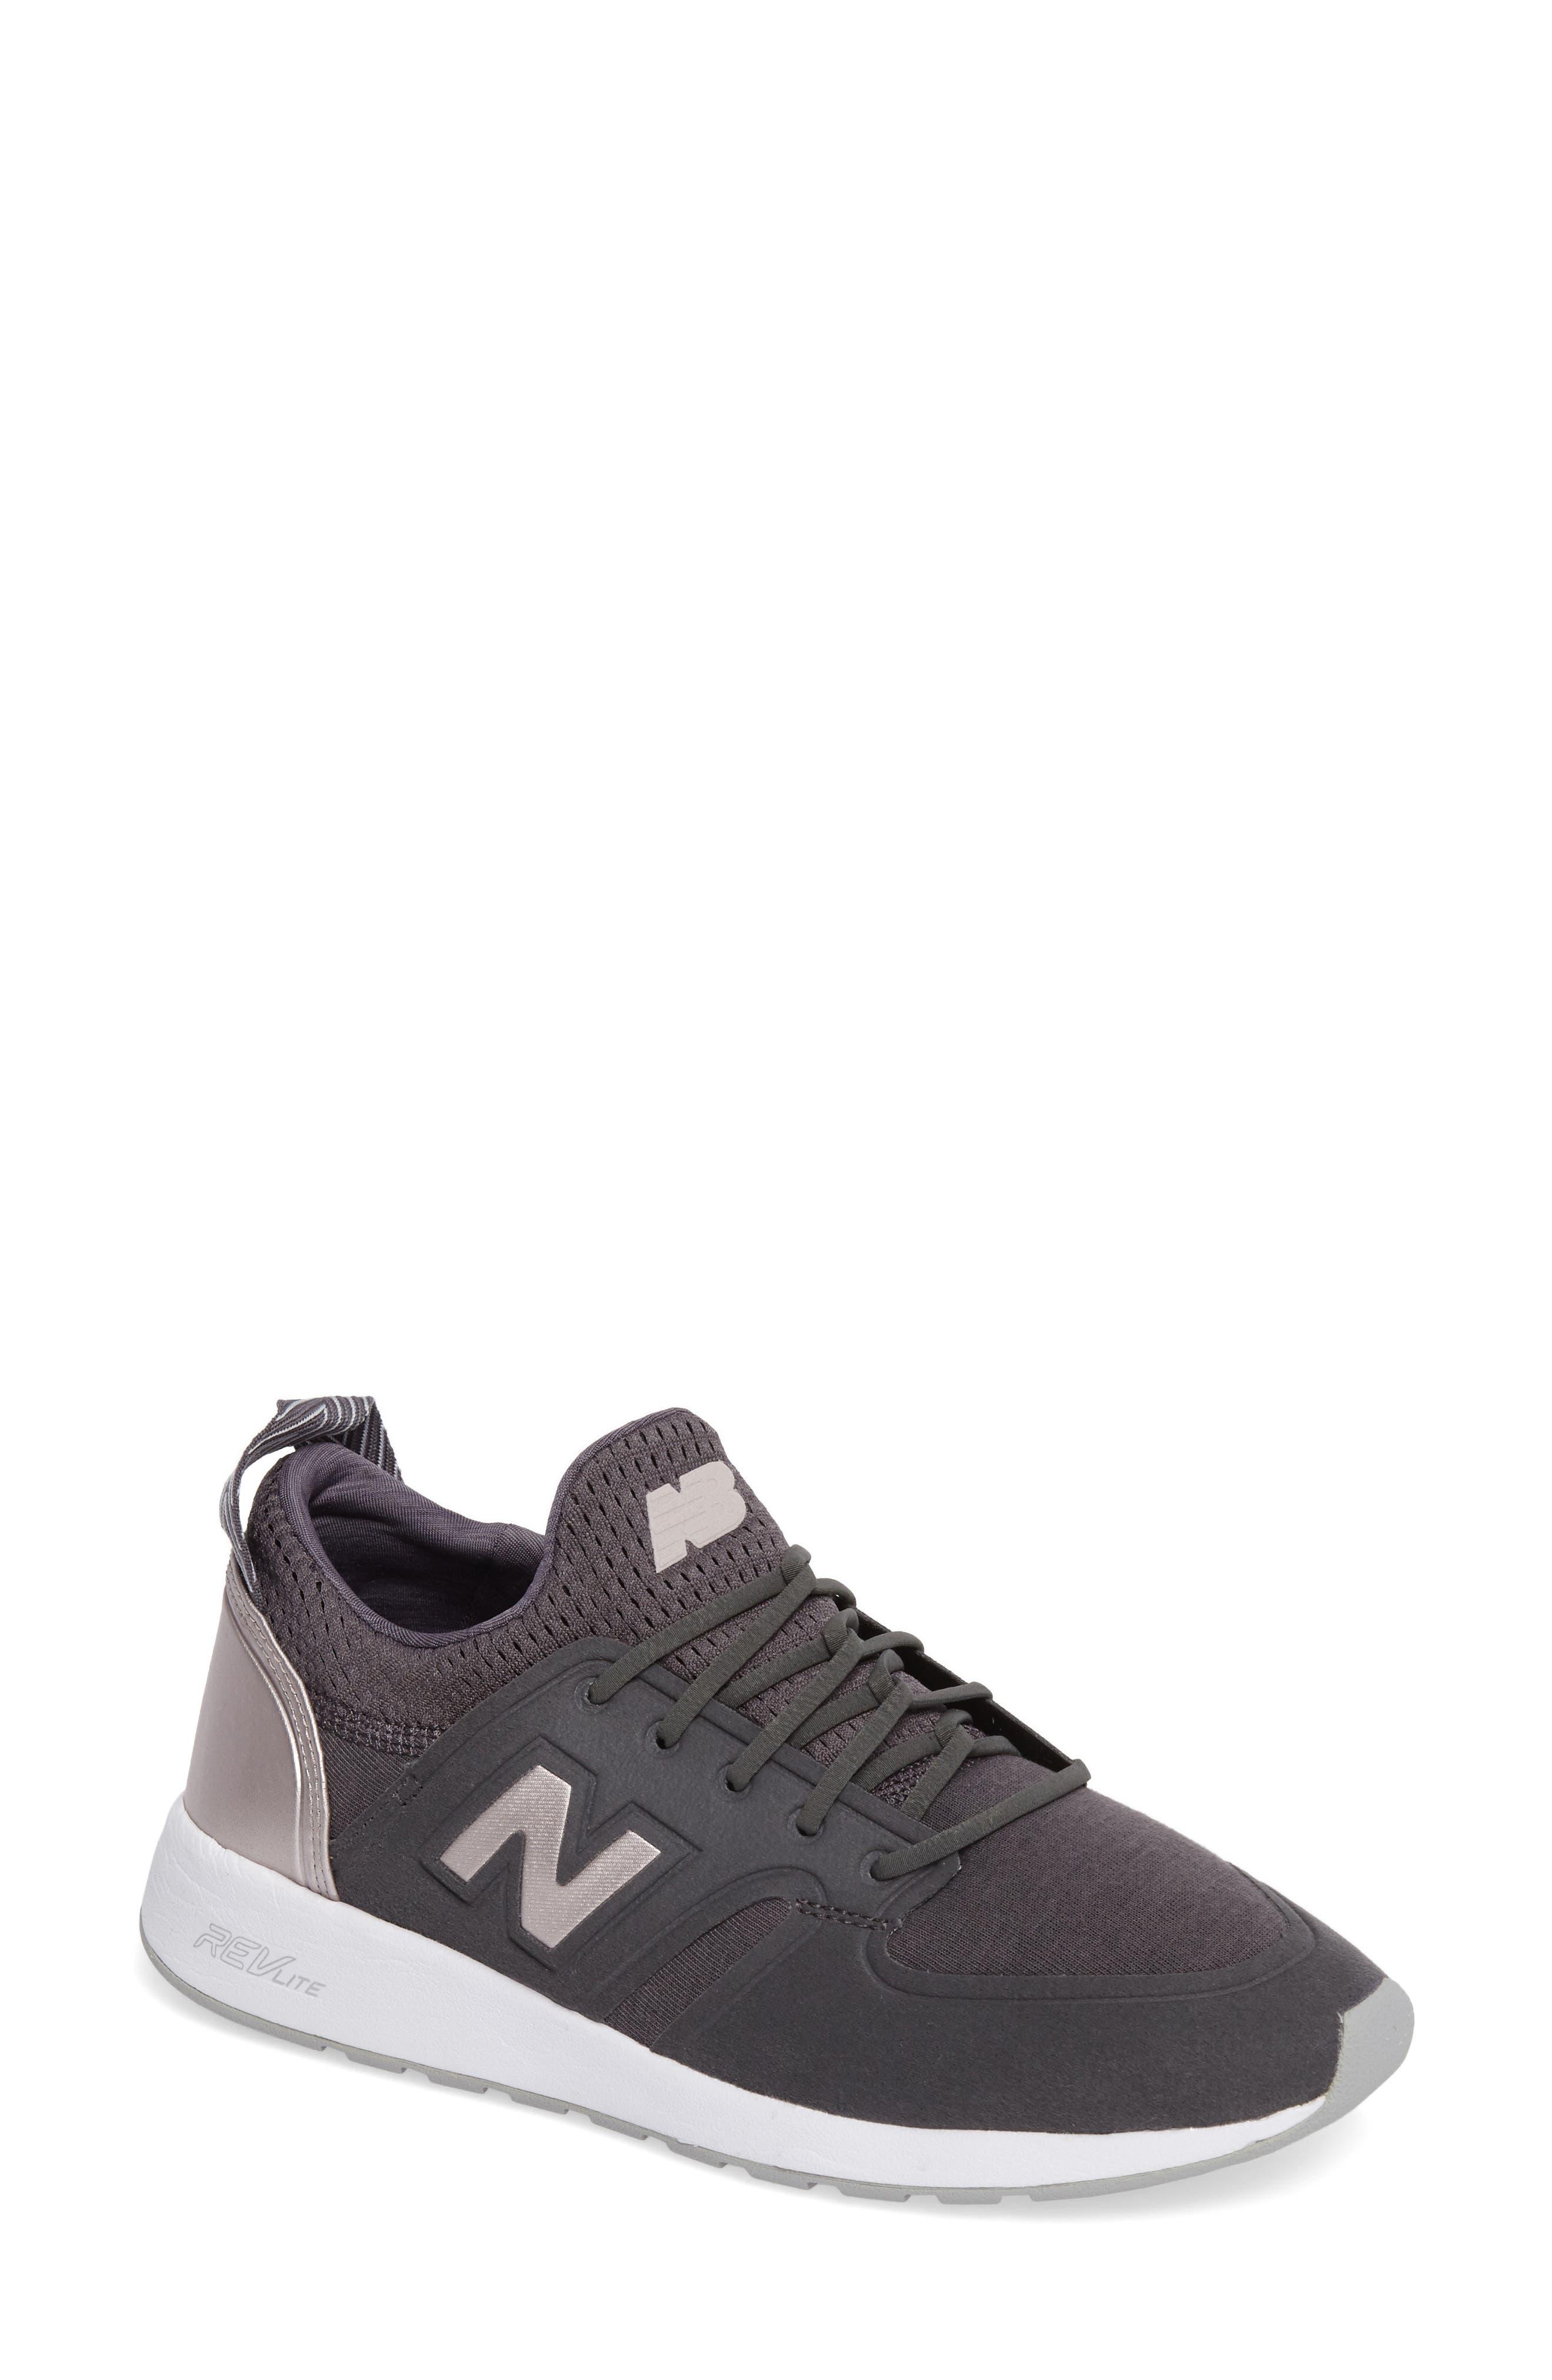 NEW BALANCE '420' Sneaker, Main, color, 021